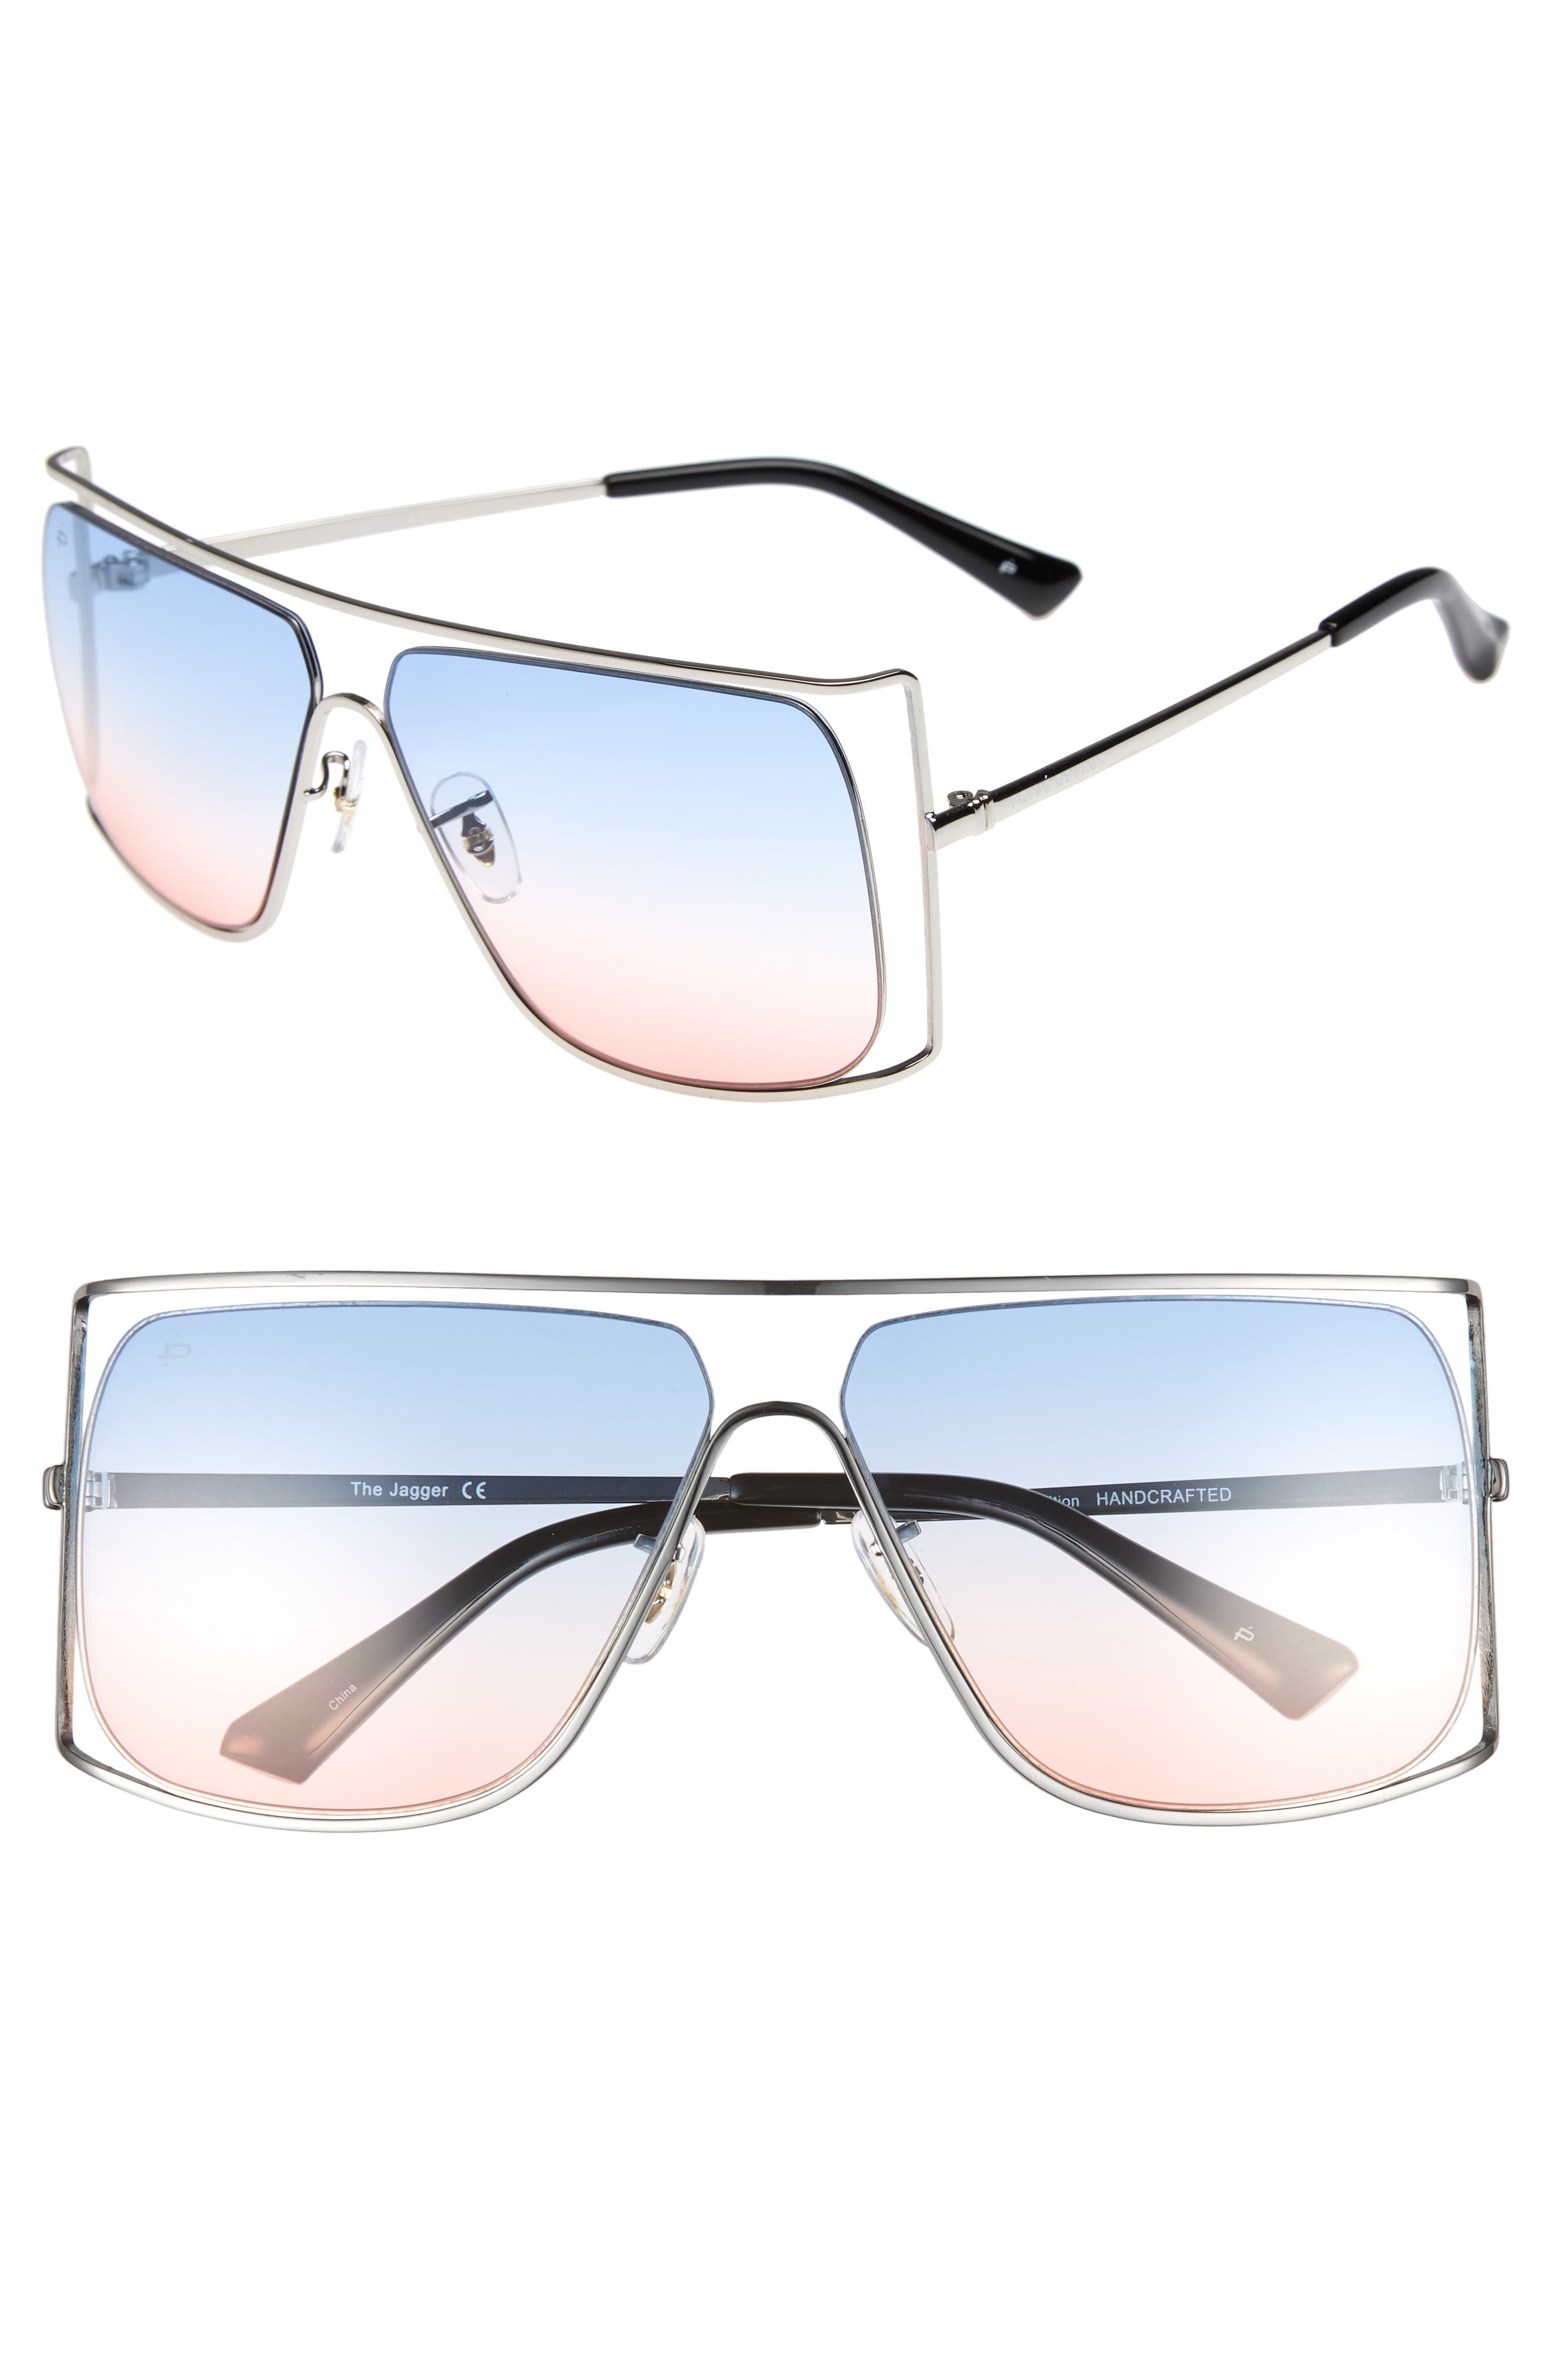 Privé Revaux The Jagger 60mm Square Sunglasses,                         Main,                         color, Silver